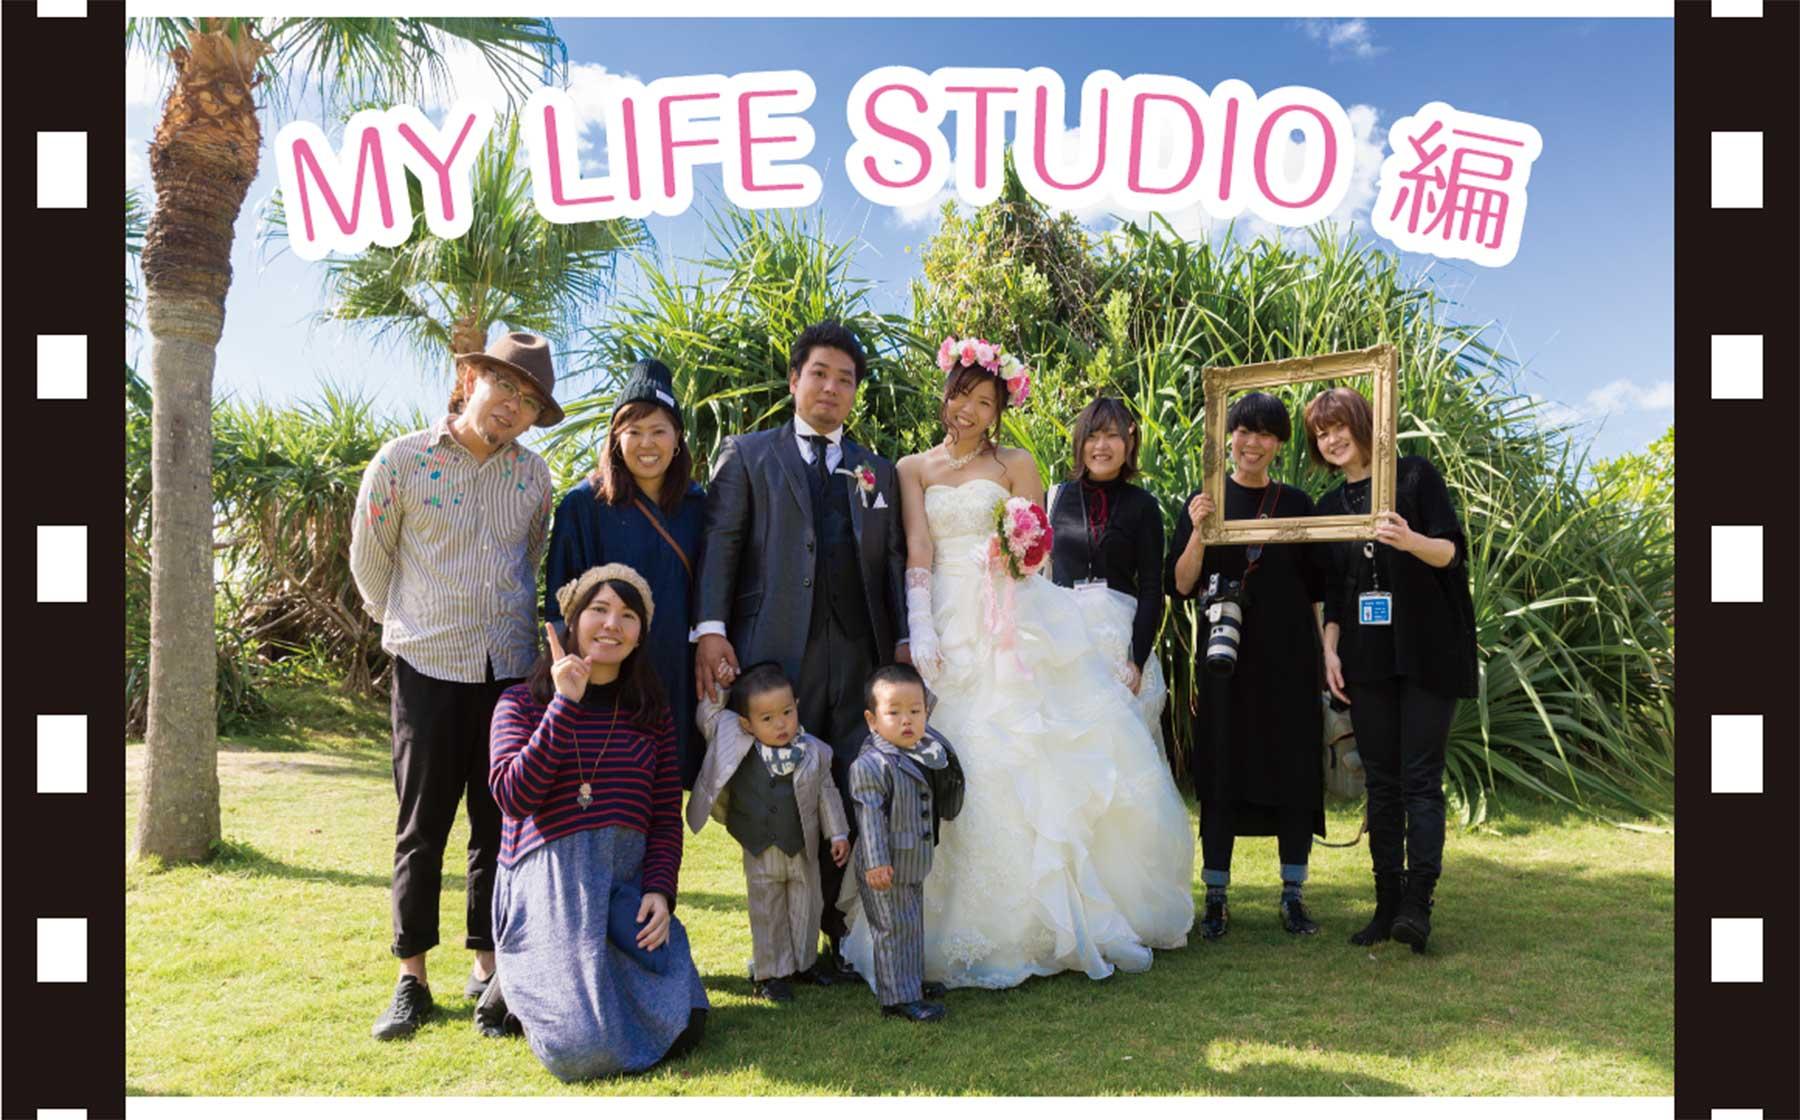 my life studio ウェディングバナー